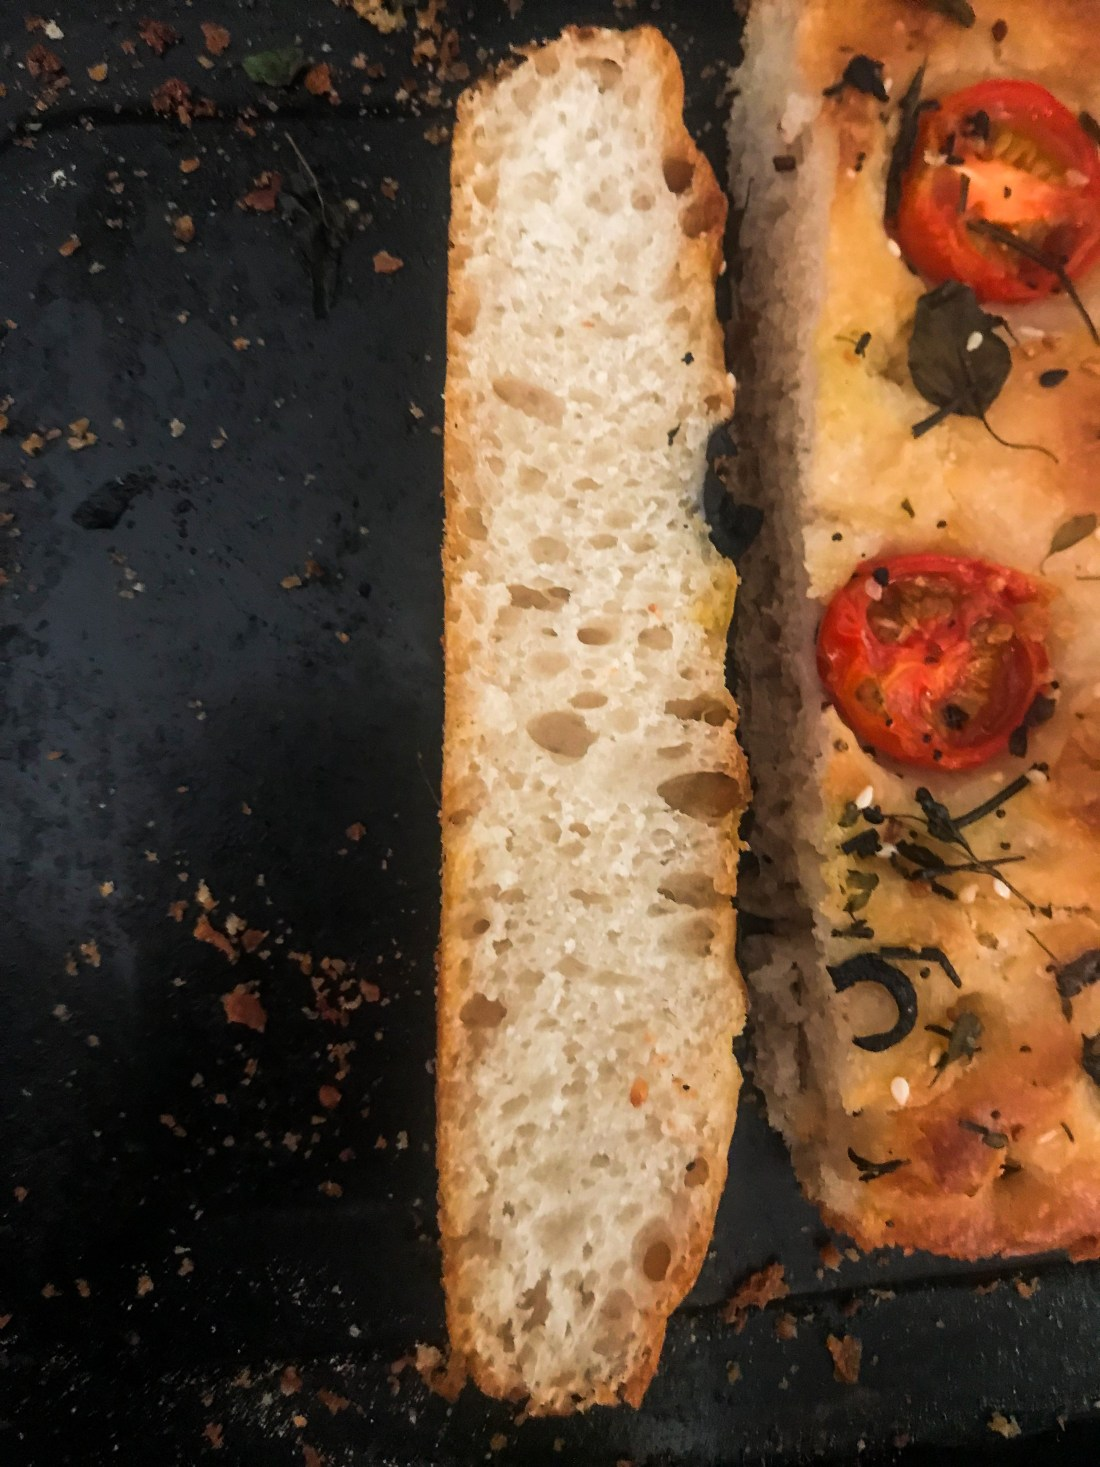 Beautiful crumb of sourdough focaccia